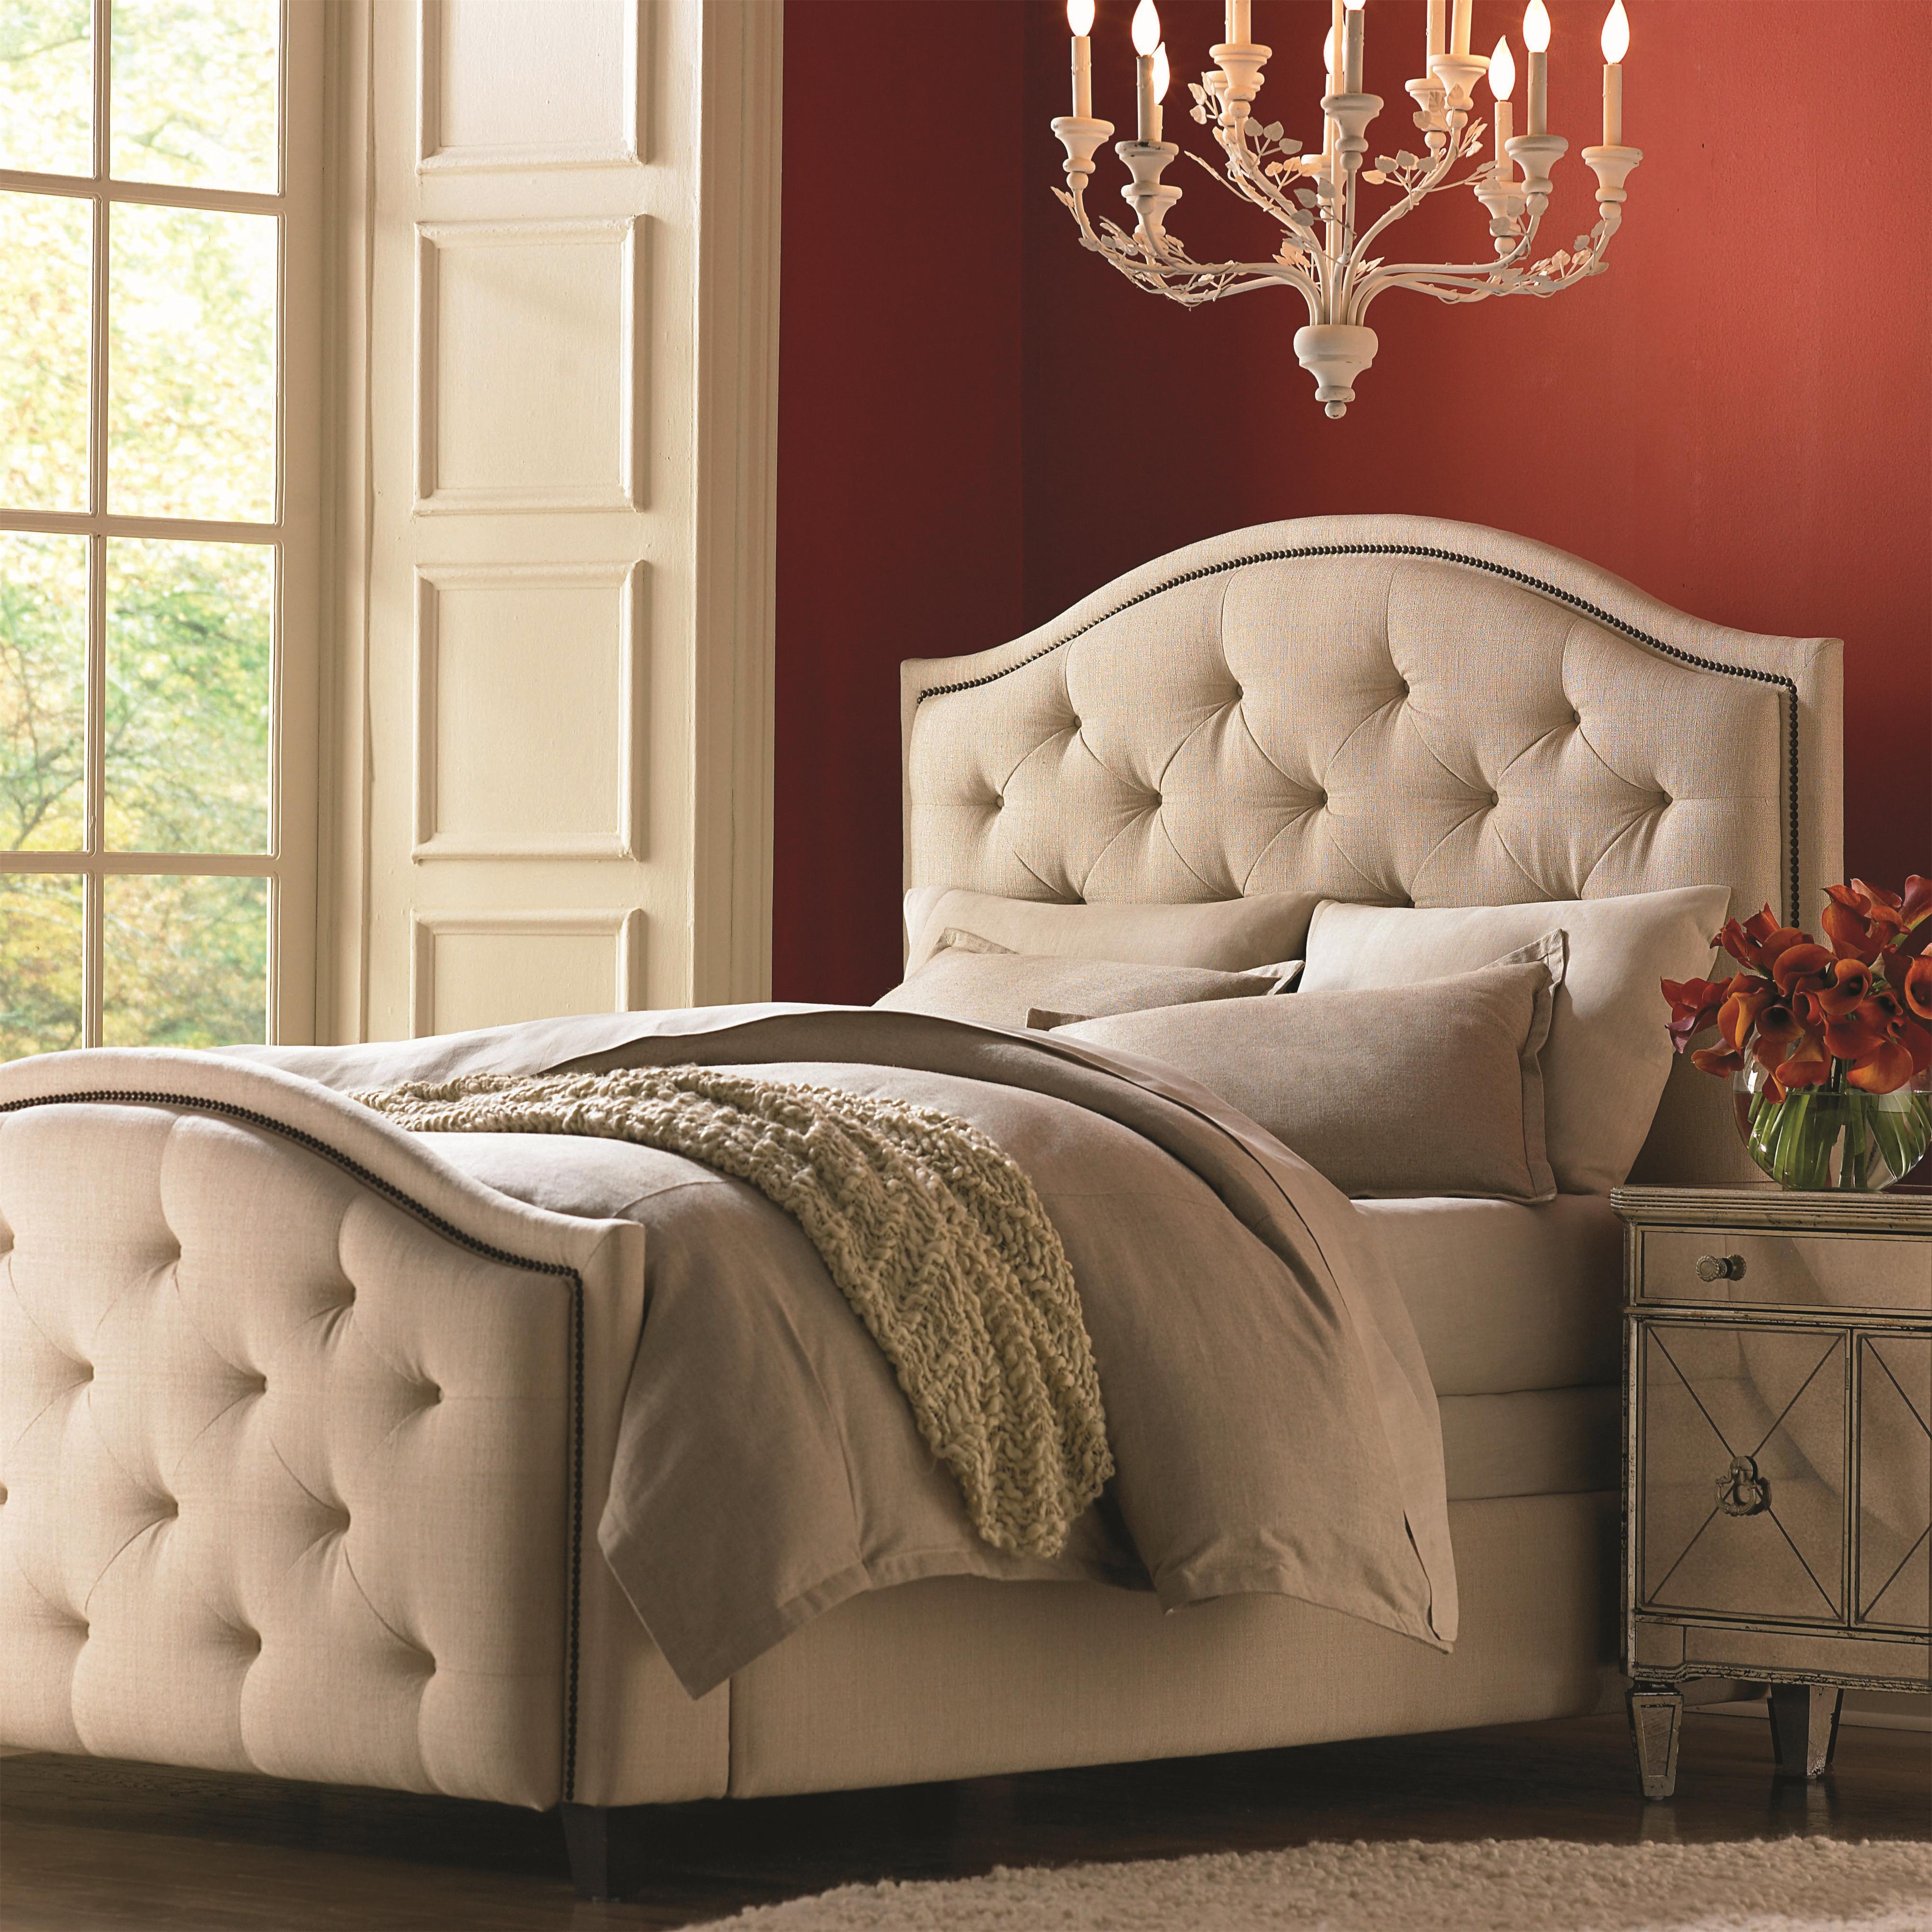 Bassett Custom Upholstered Beds King Vienna Upholstered Headboard And High Footboard Bed Becker Furniture Upholstered Beds